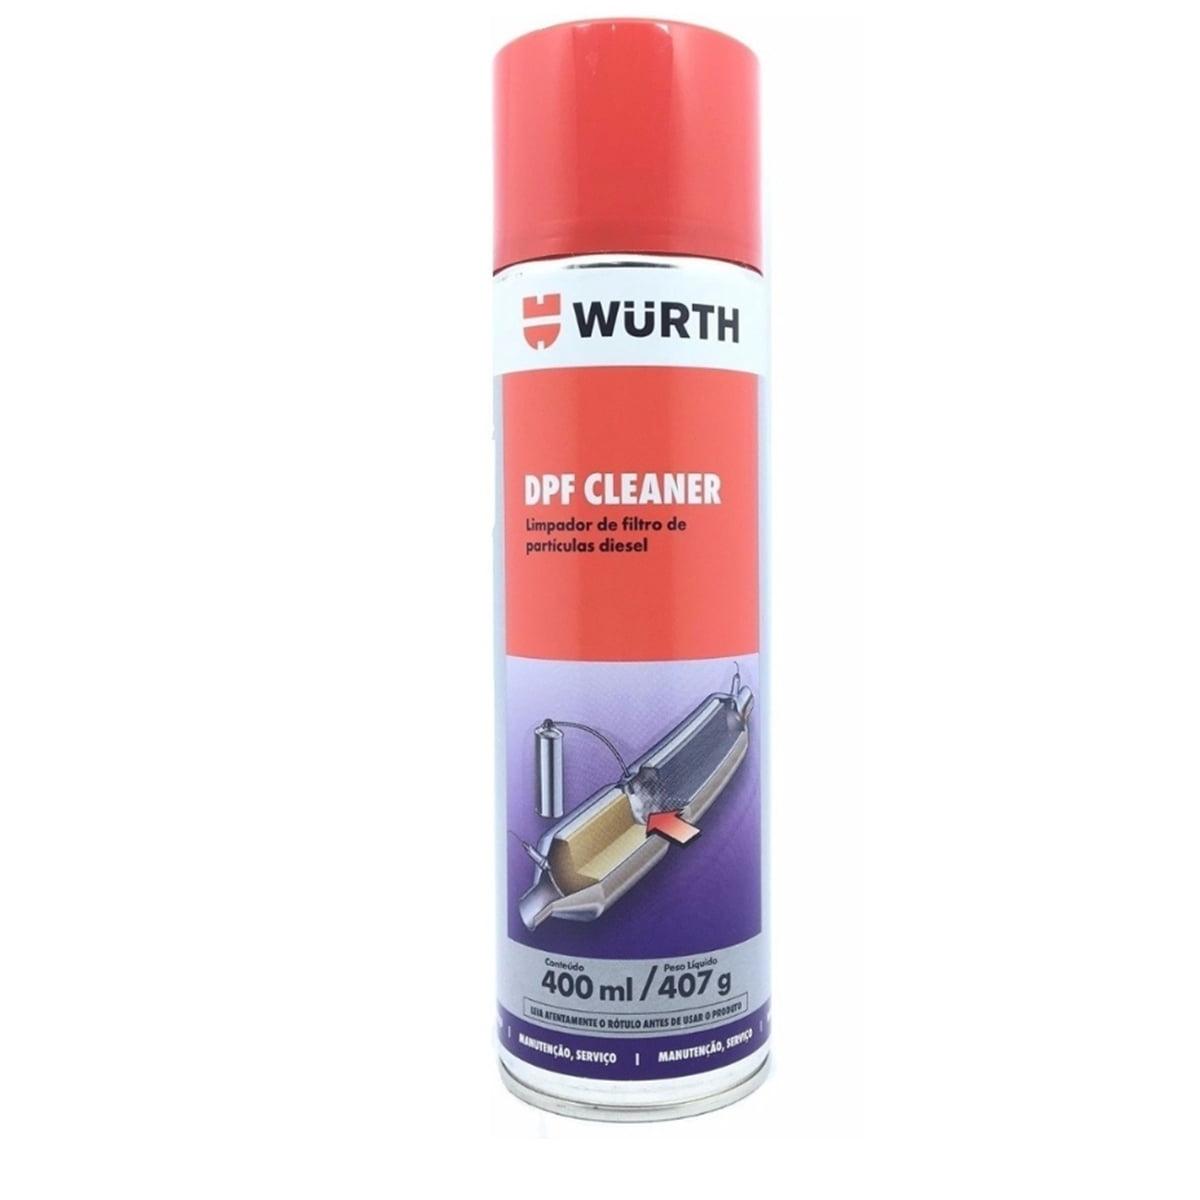 Limpador De Filtro de Partículas Diesel DPF Cleaner Wurth 400ml  em até 6x sem juros